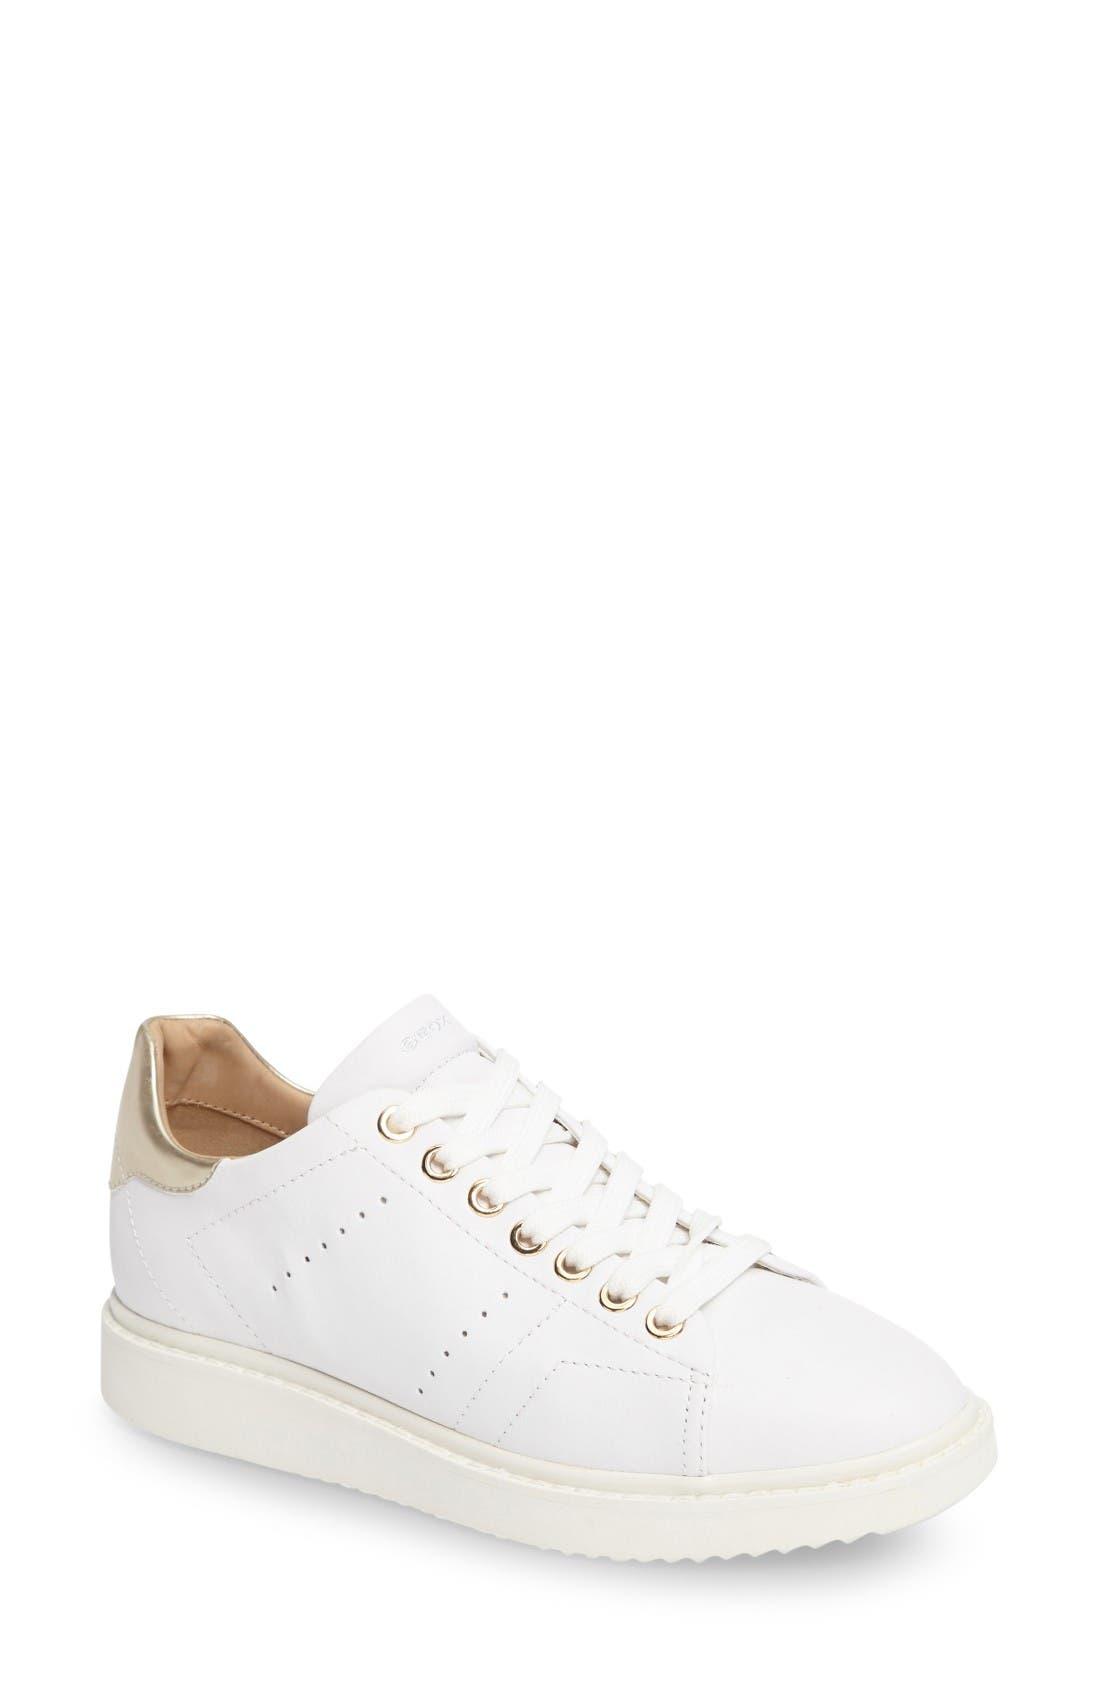 Alternate Image 1 Selected - Geox Thymar Sneaker (Women)